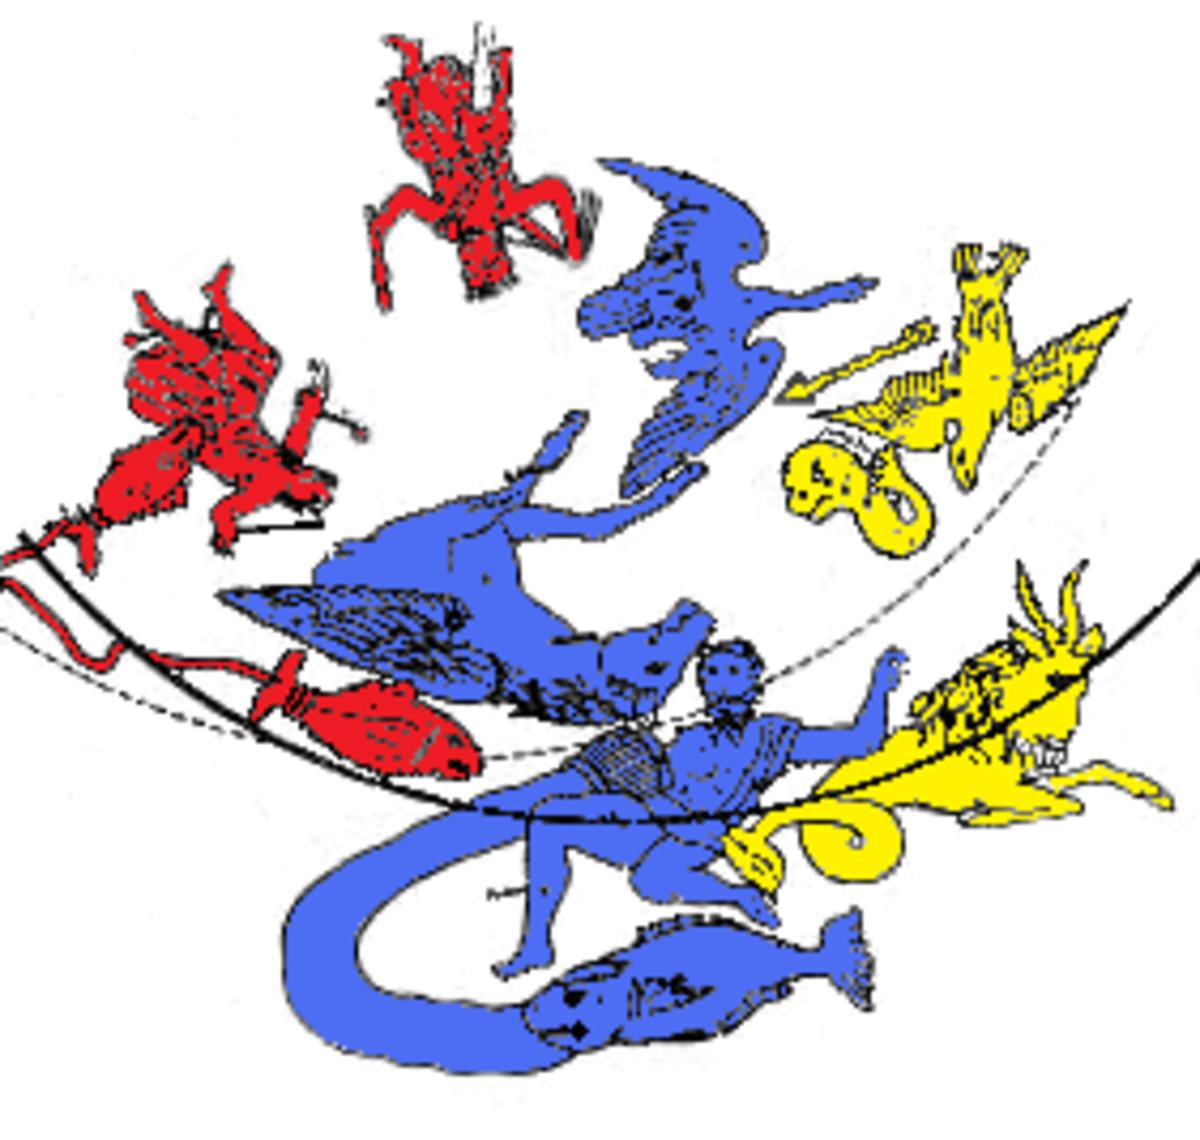 The Third Season has the three Zodiac constellations; Pisces, Aquarius, and Capricorn.